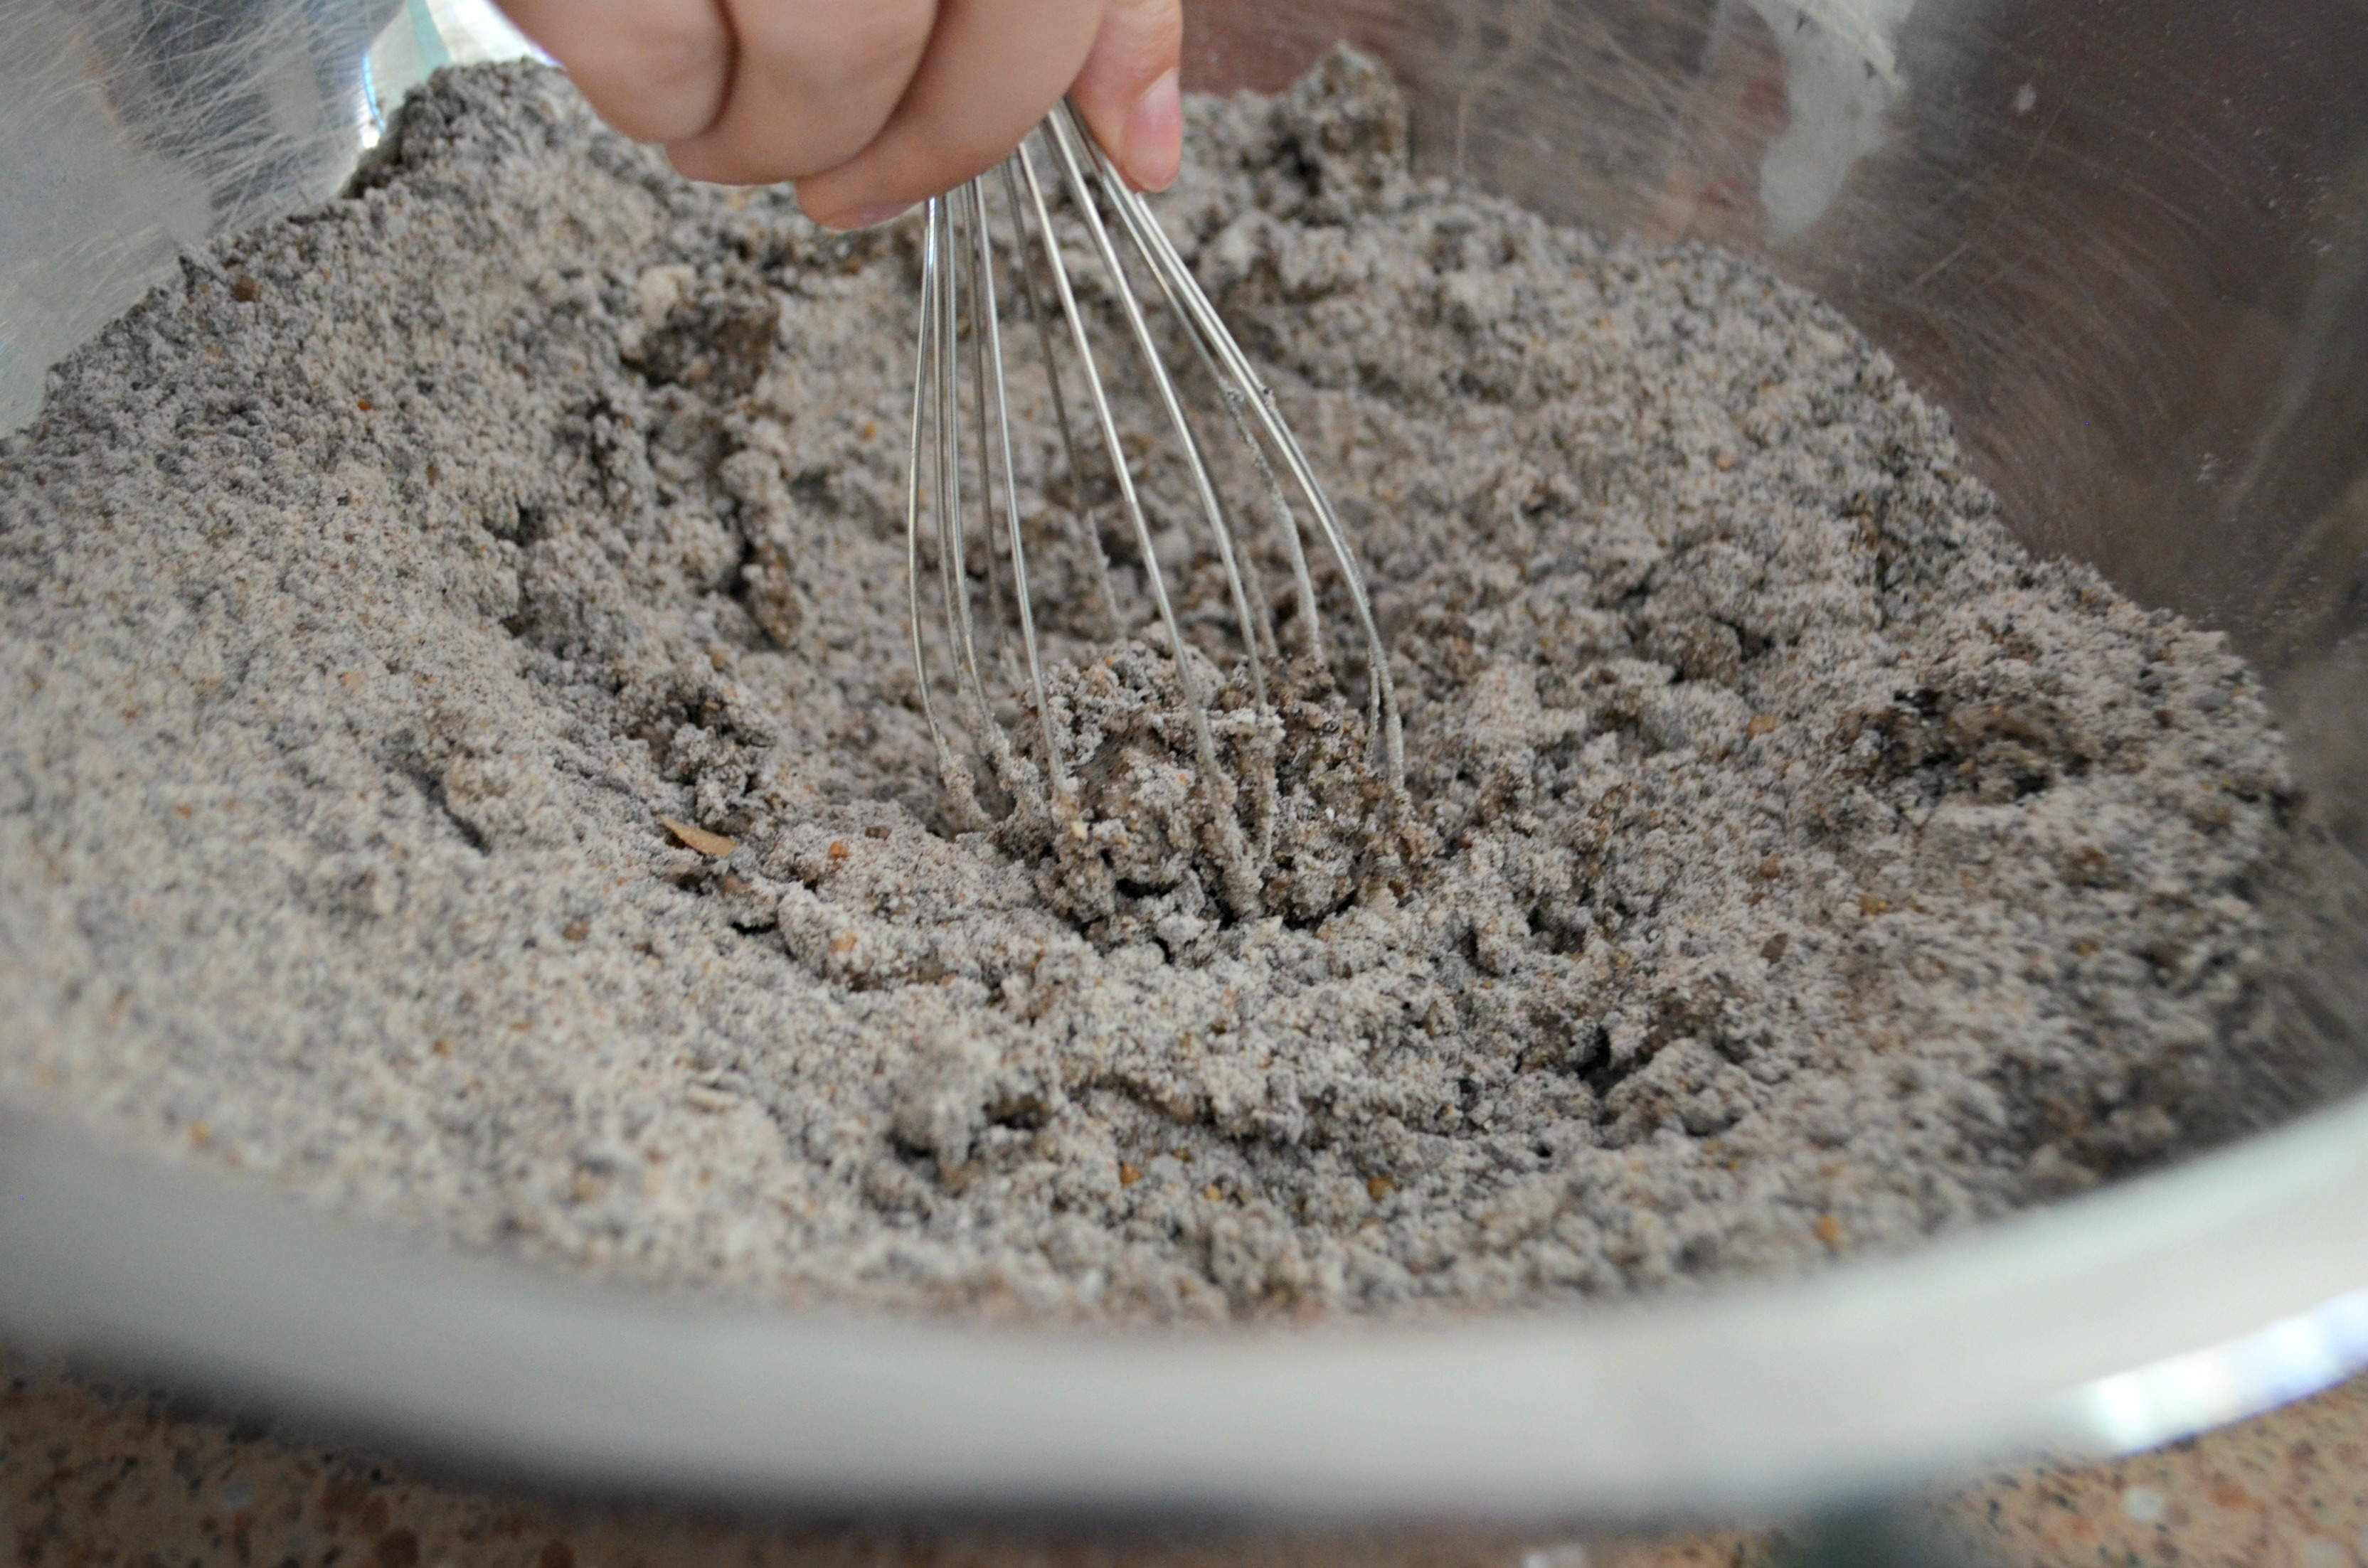 diy dinosaur surprise eggs – Mixing the ingredients